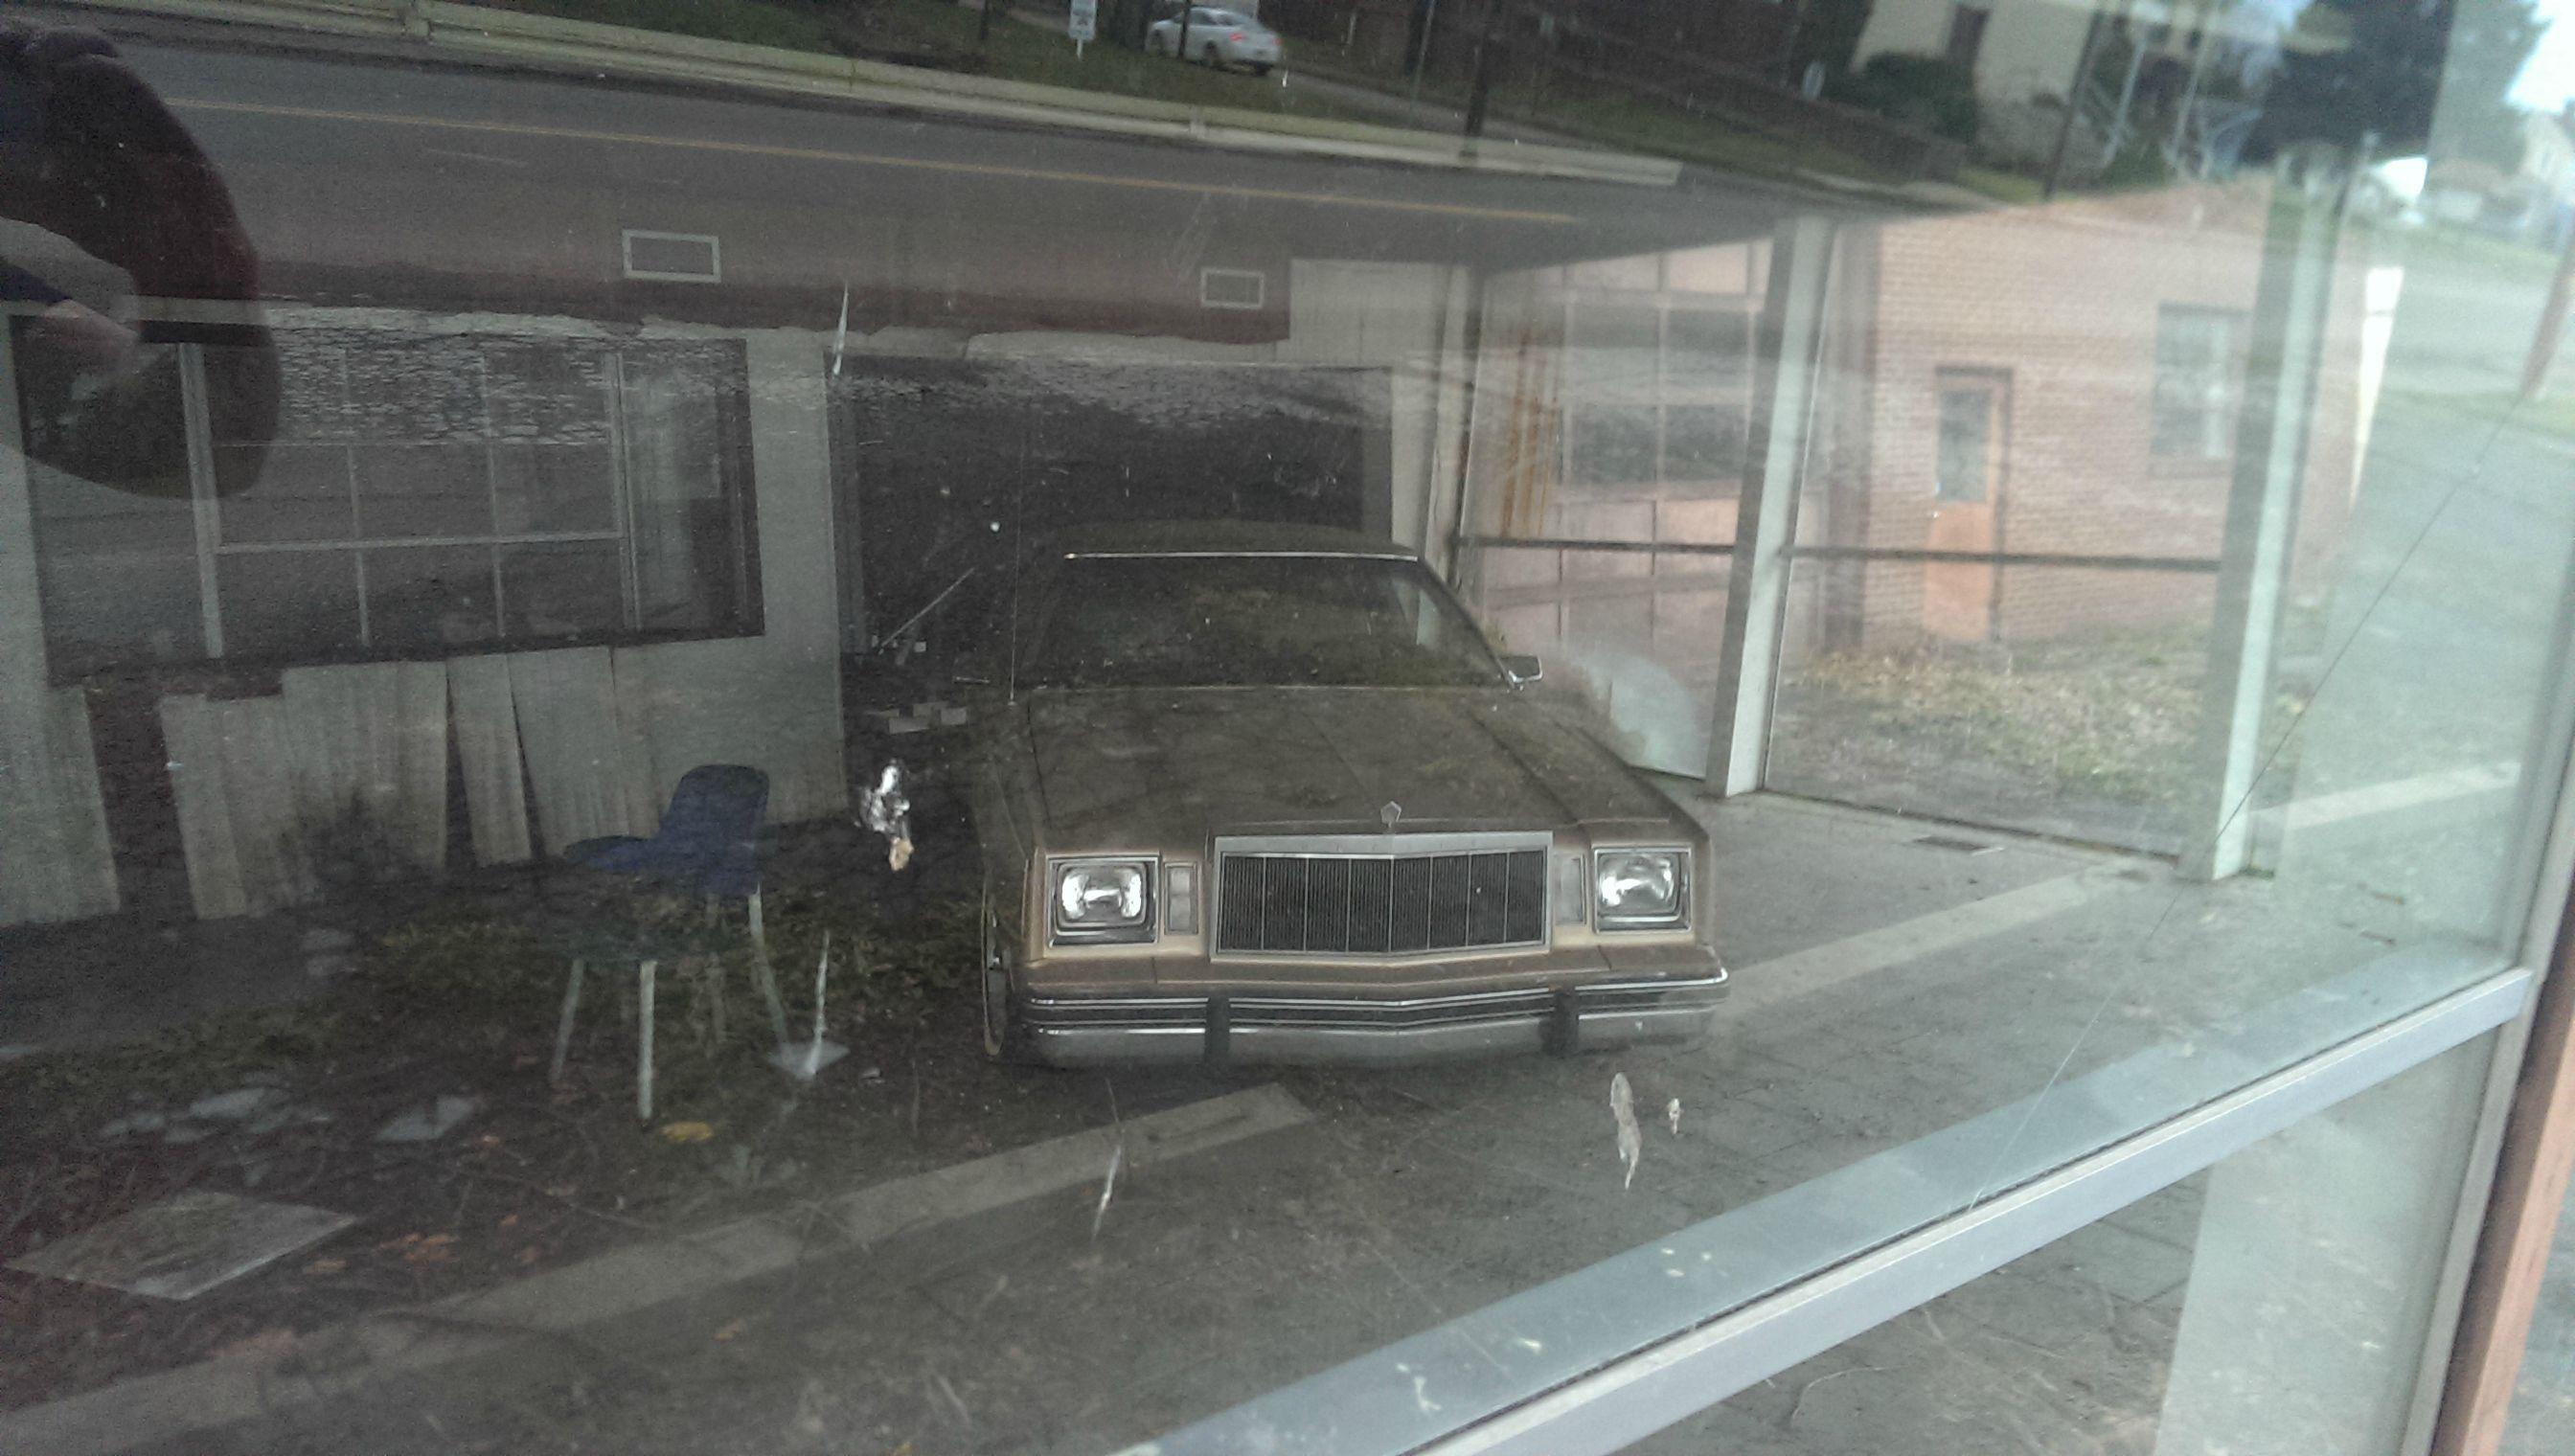 An Abandoned Chrysler Dealership In Ohio Abandoned Abandoned Cars Car Dealership